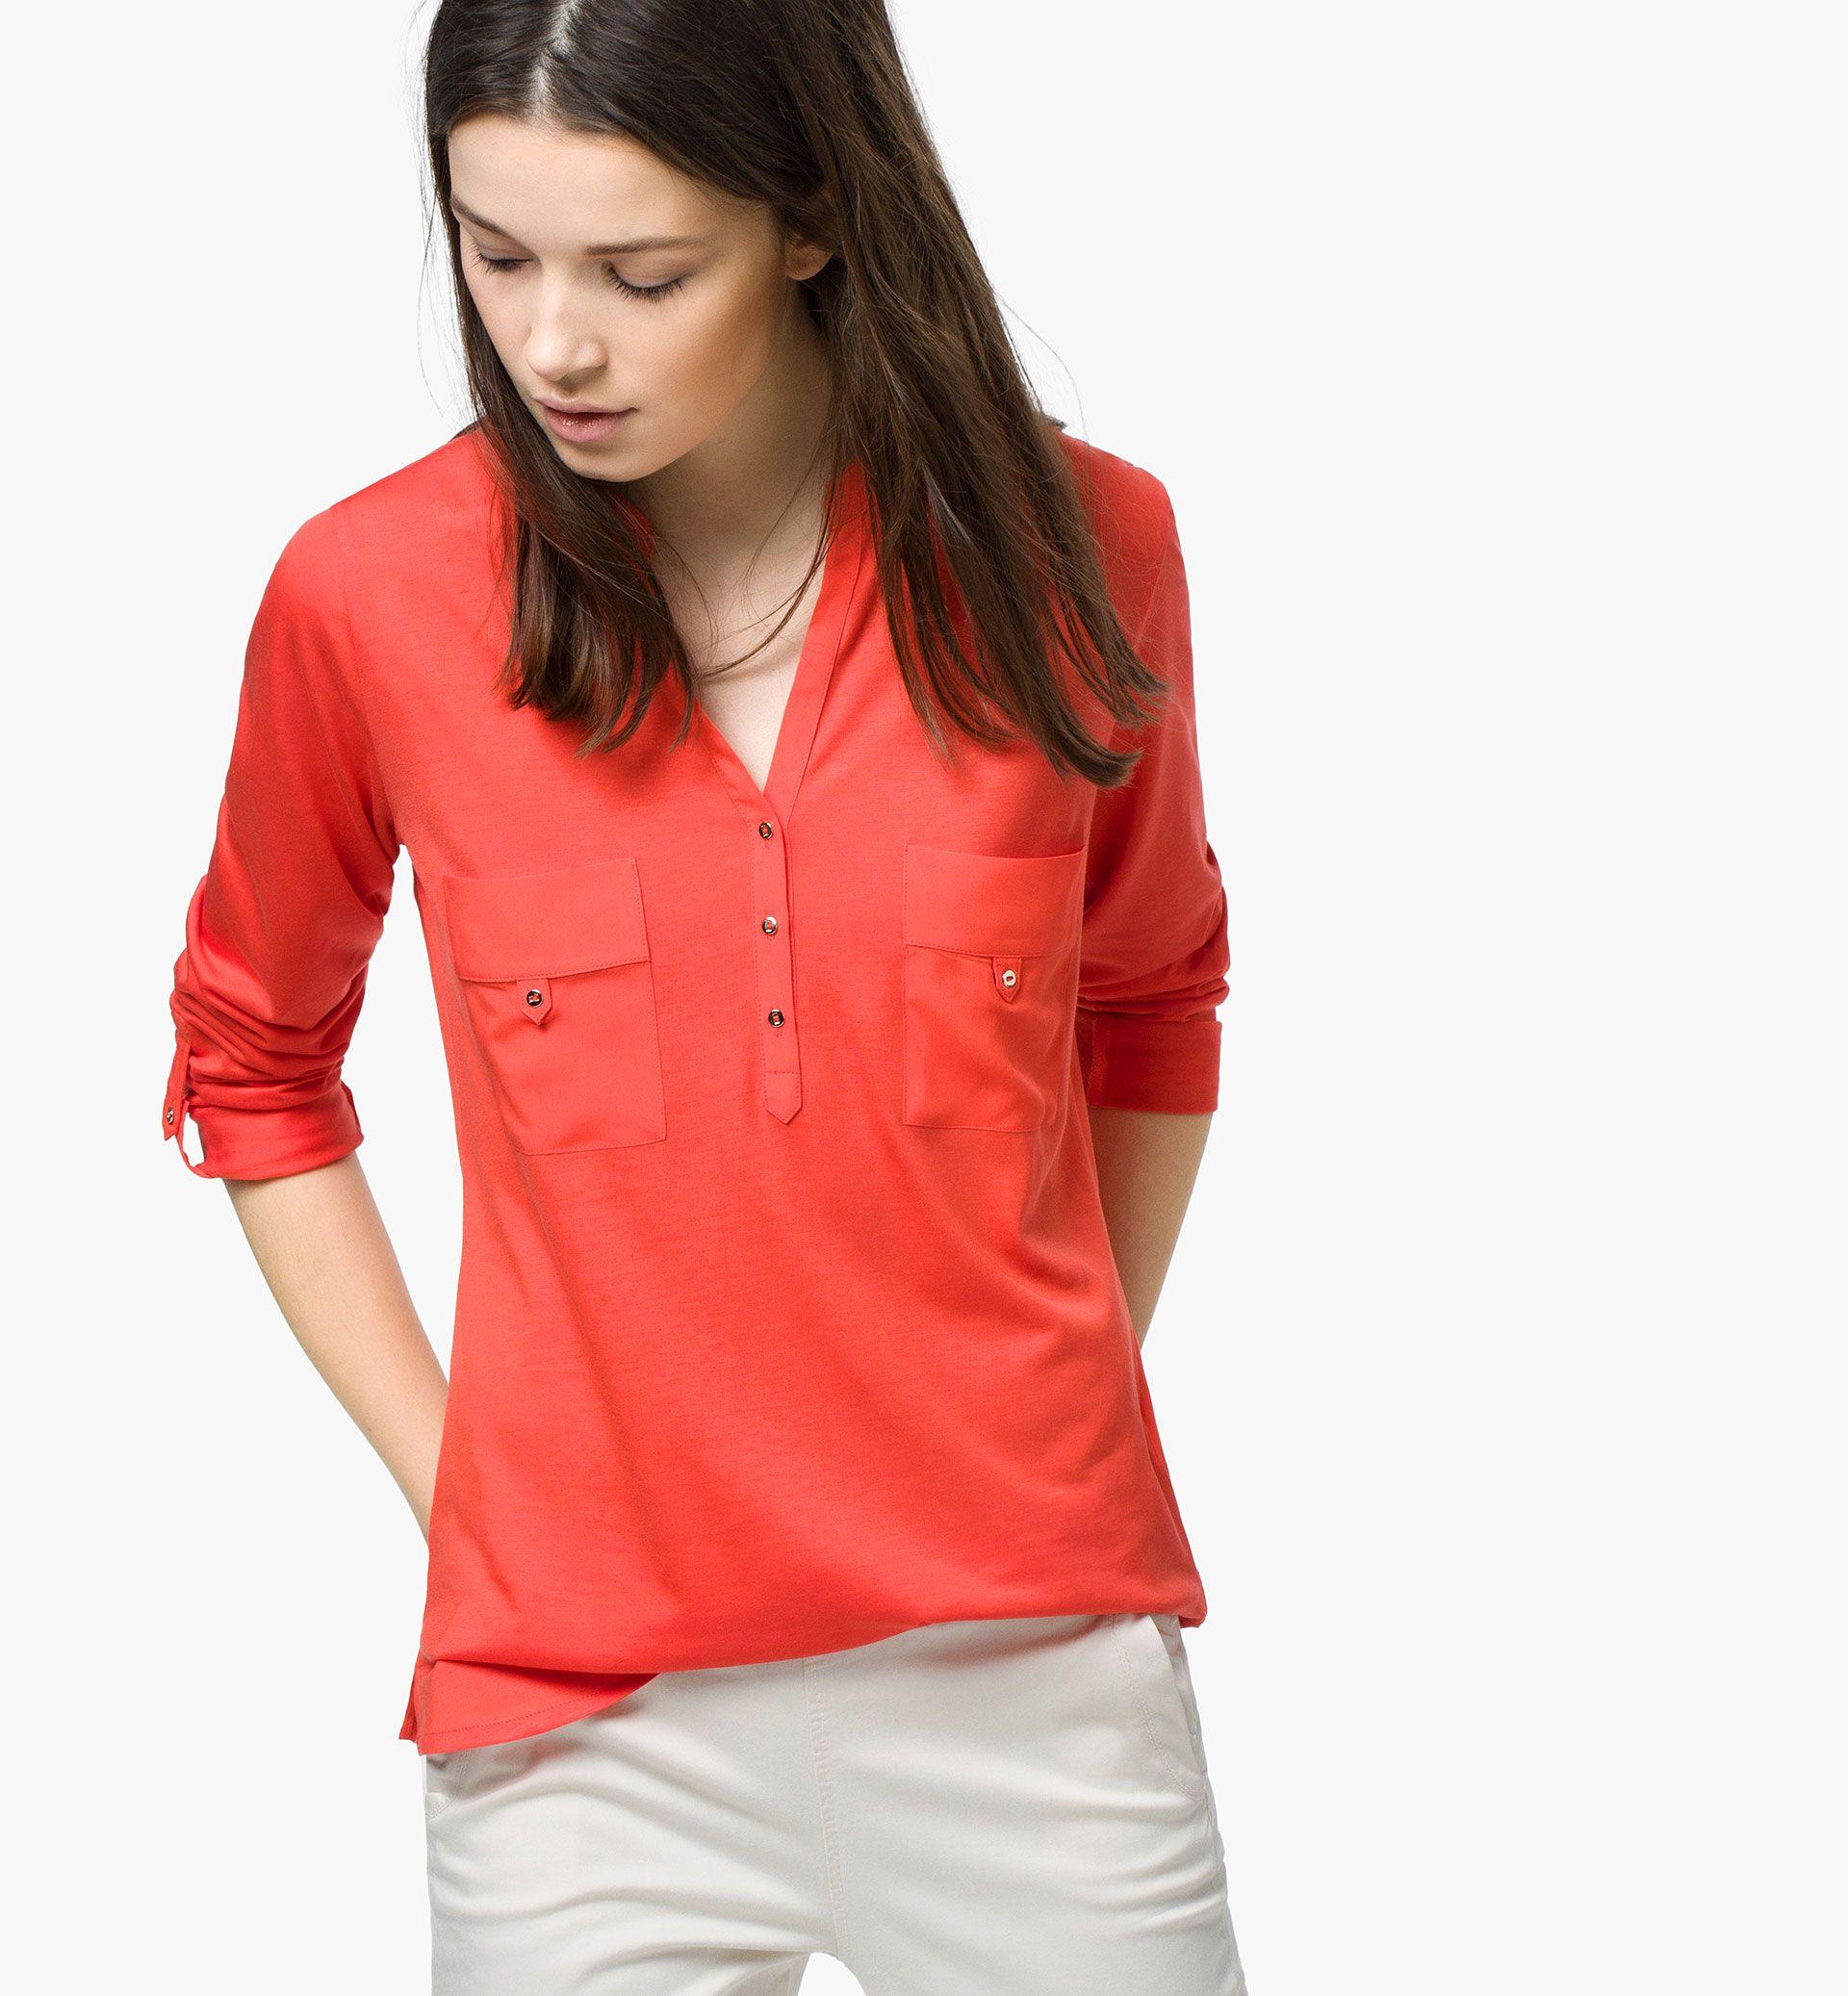 MANDARIN-COLLAR POLO SHIRT - T-shirts - WOMEN - United States of America / Estados Unidos de América